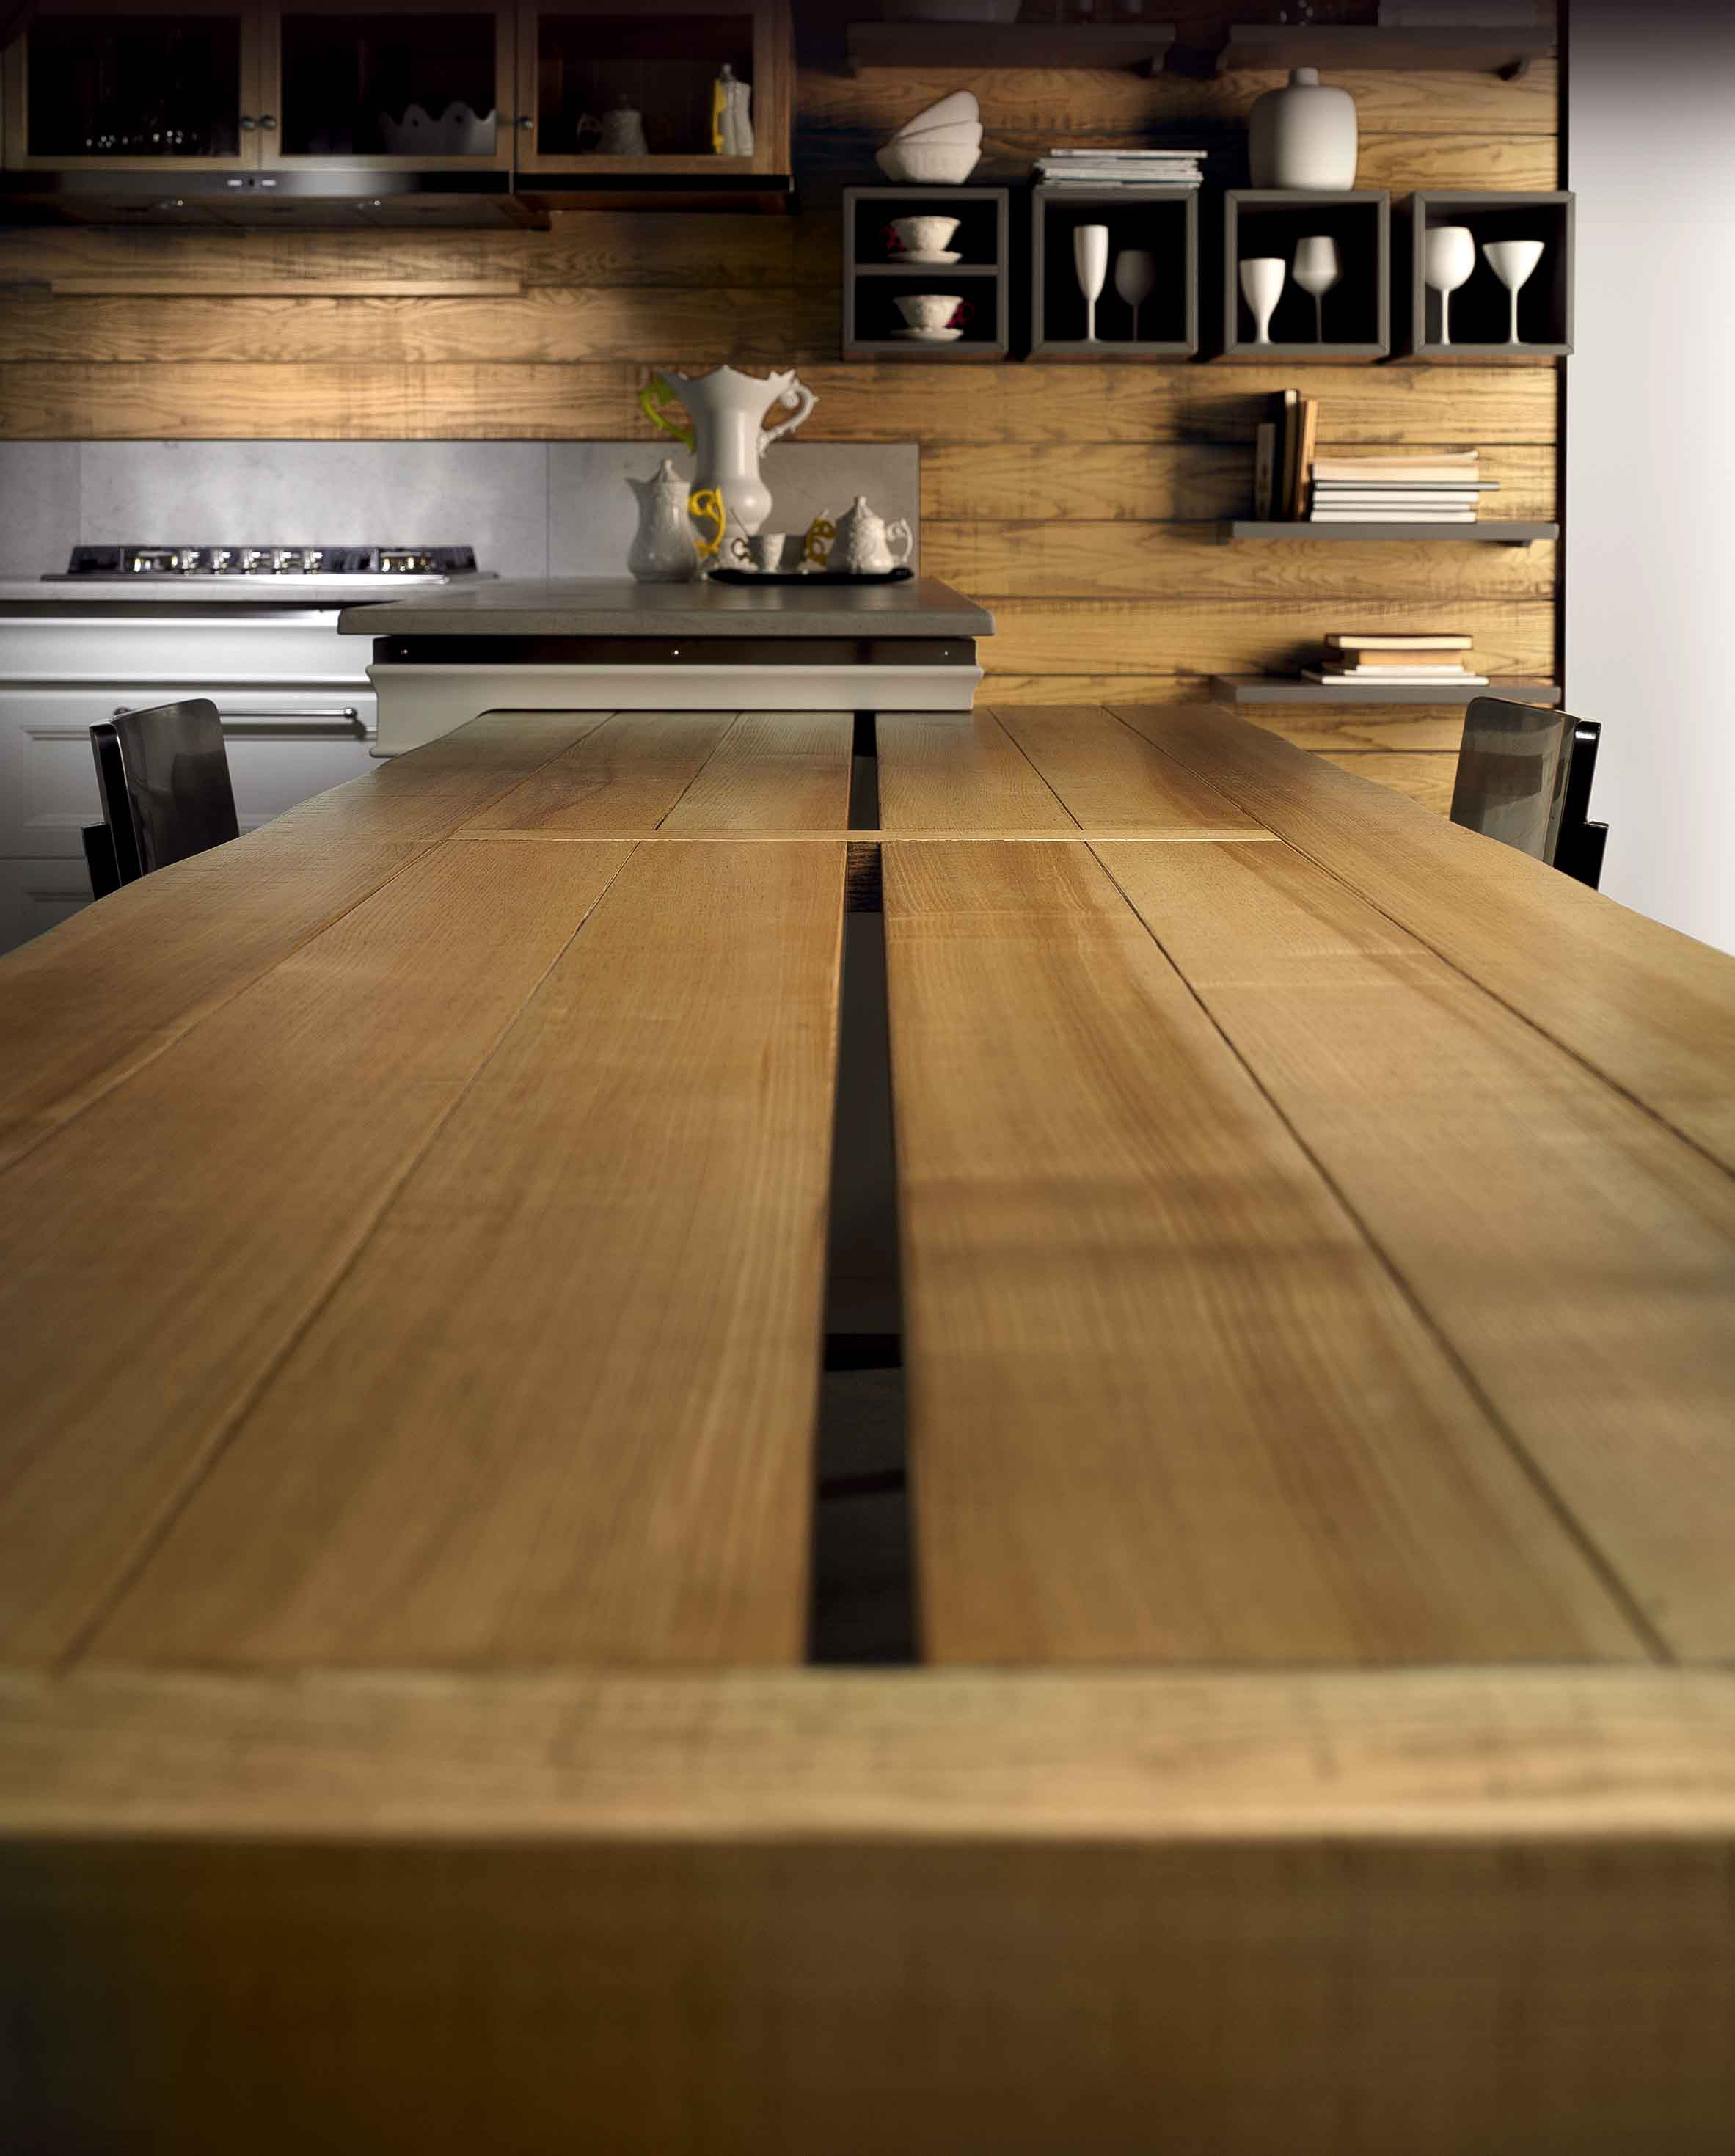 Cucina Living Design - La cucina classica intramontabile | L\'Ottocento